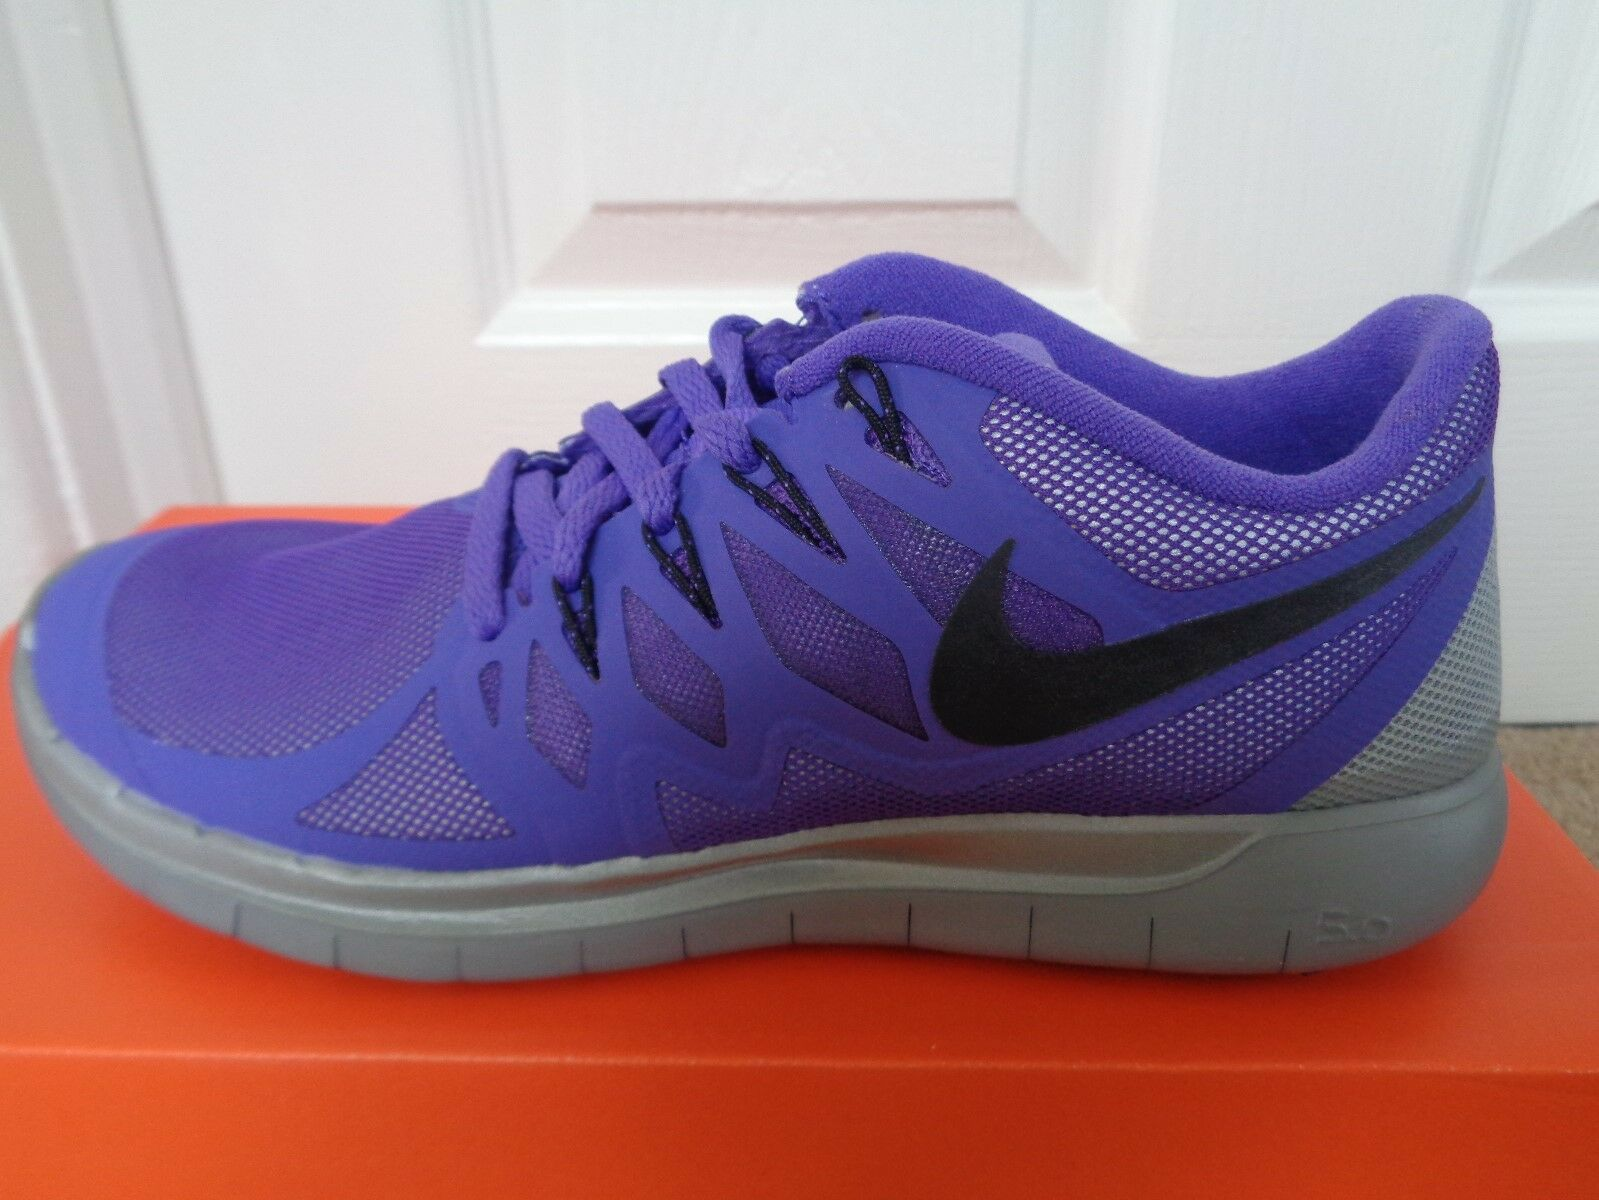 Nike Free 5.0 685169 Flash femmes  trainers chaussures 685169 5.0 500 uk 5.5 eu 39 us 8 NEWBOX bbca0d